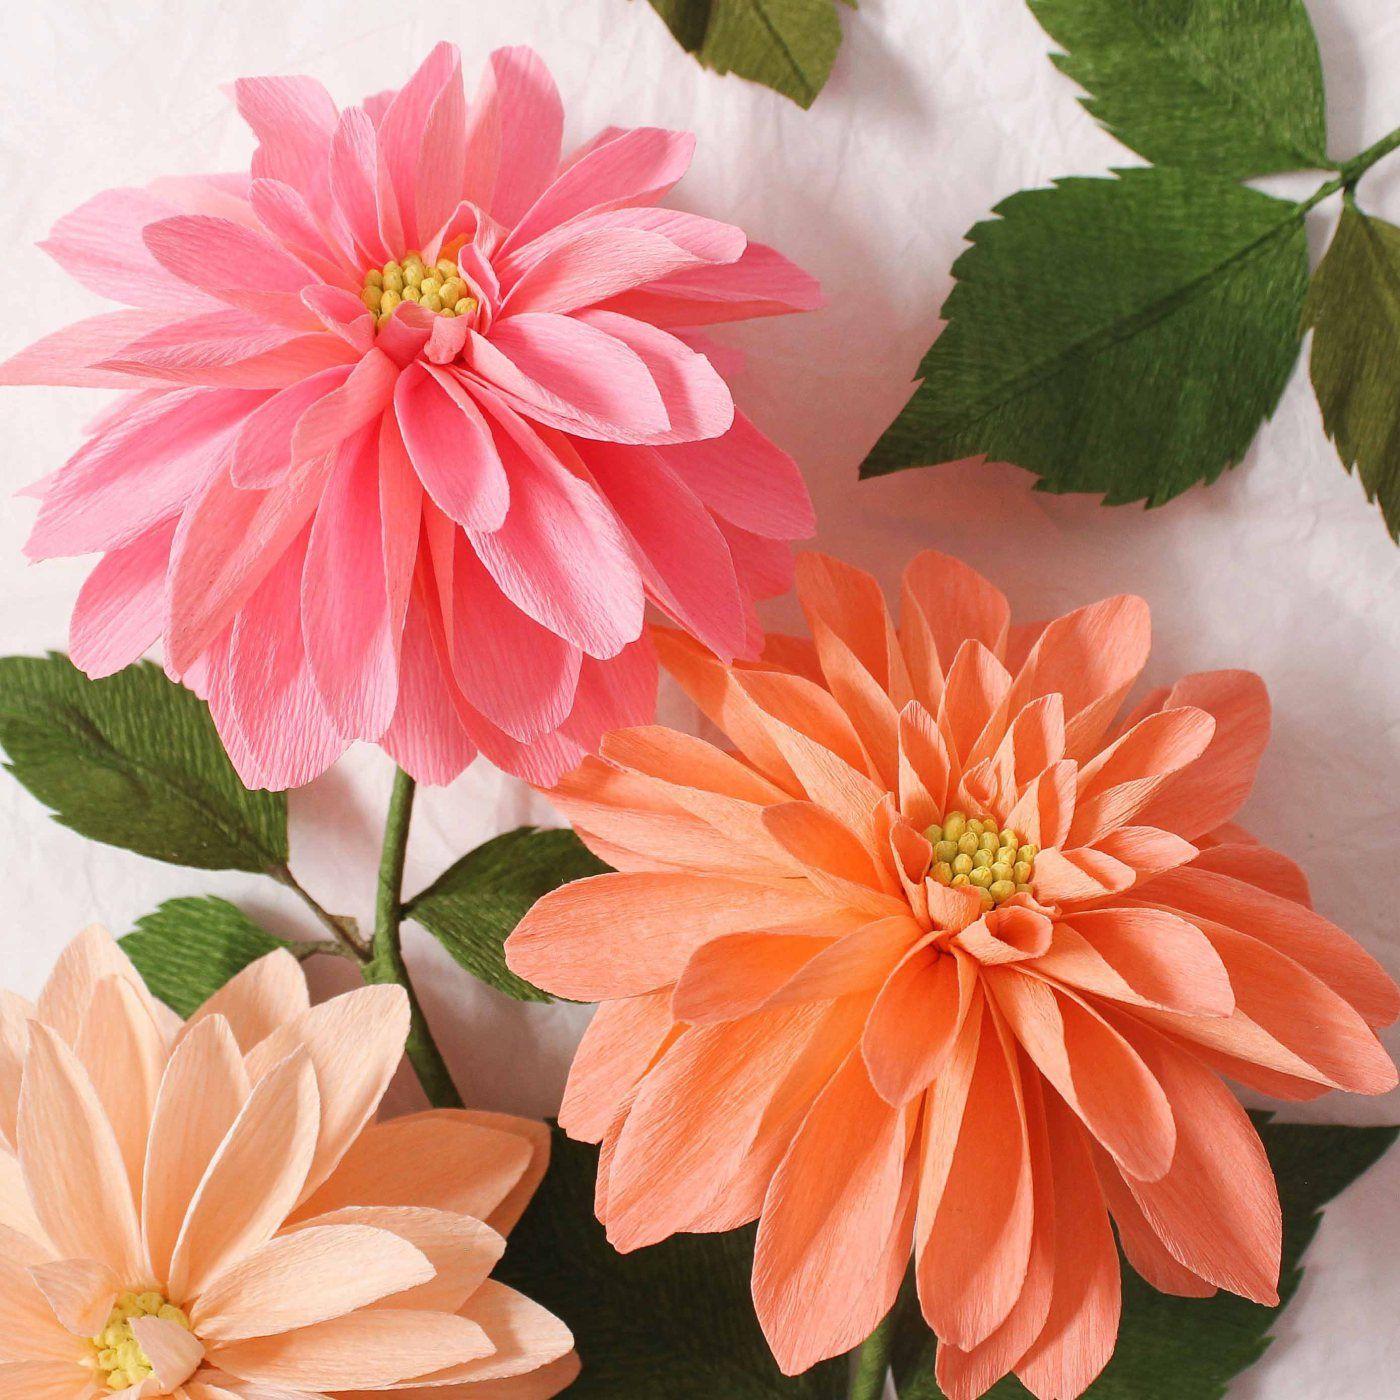 Paper Flowers By Uk Paper Flower Artist A Petal Unfolds 紙花